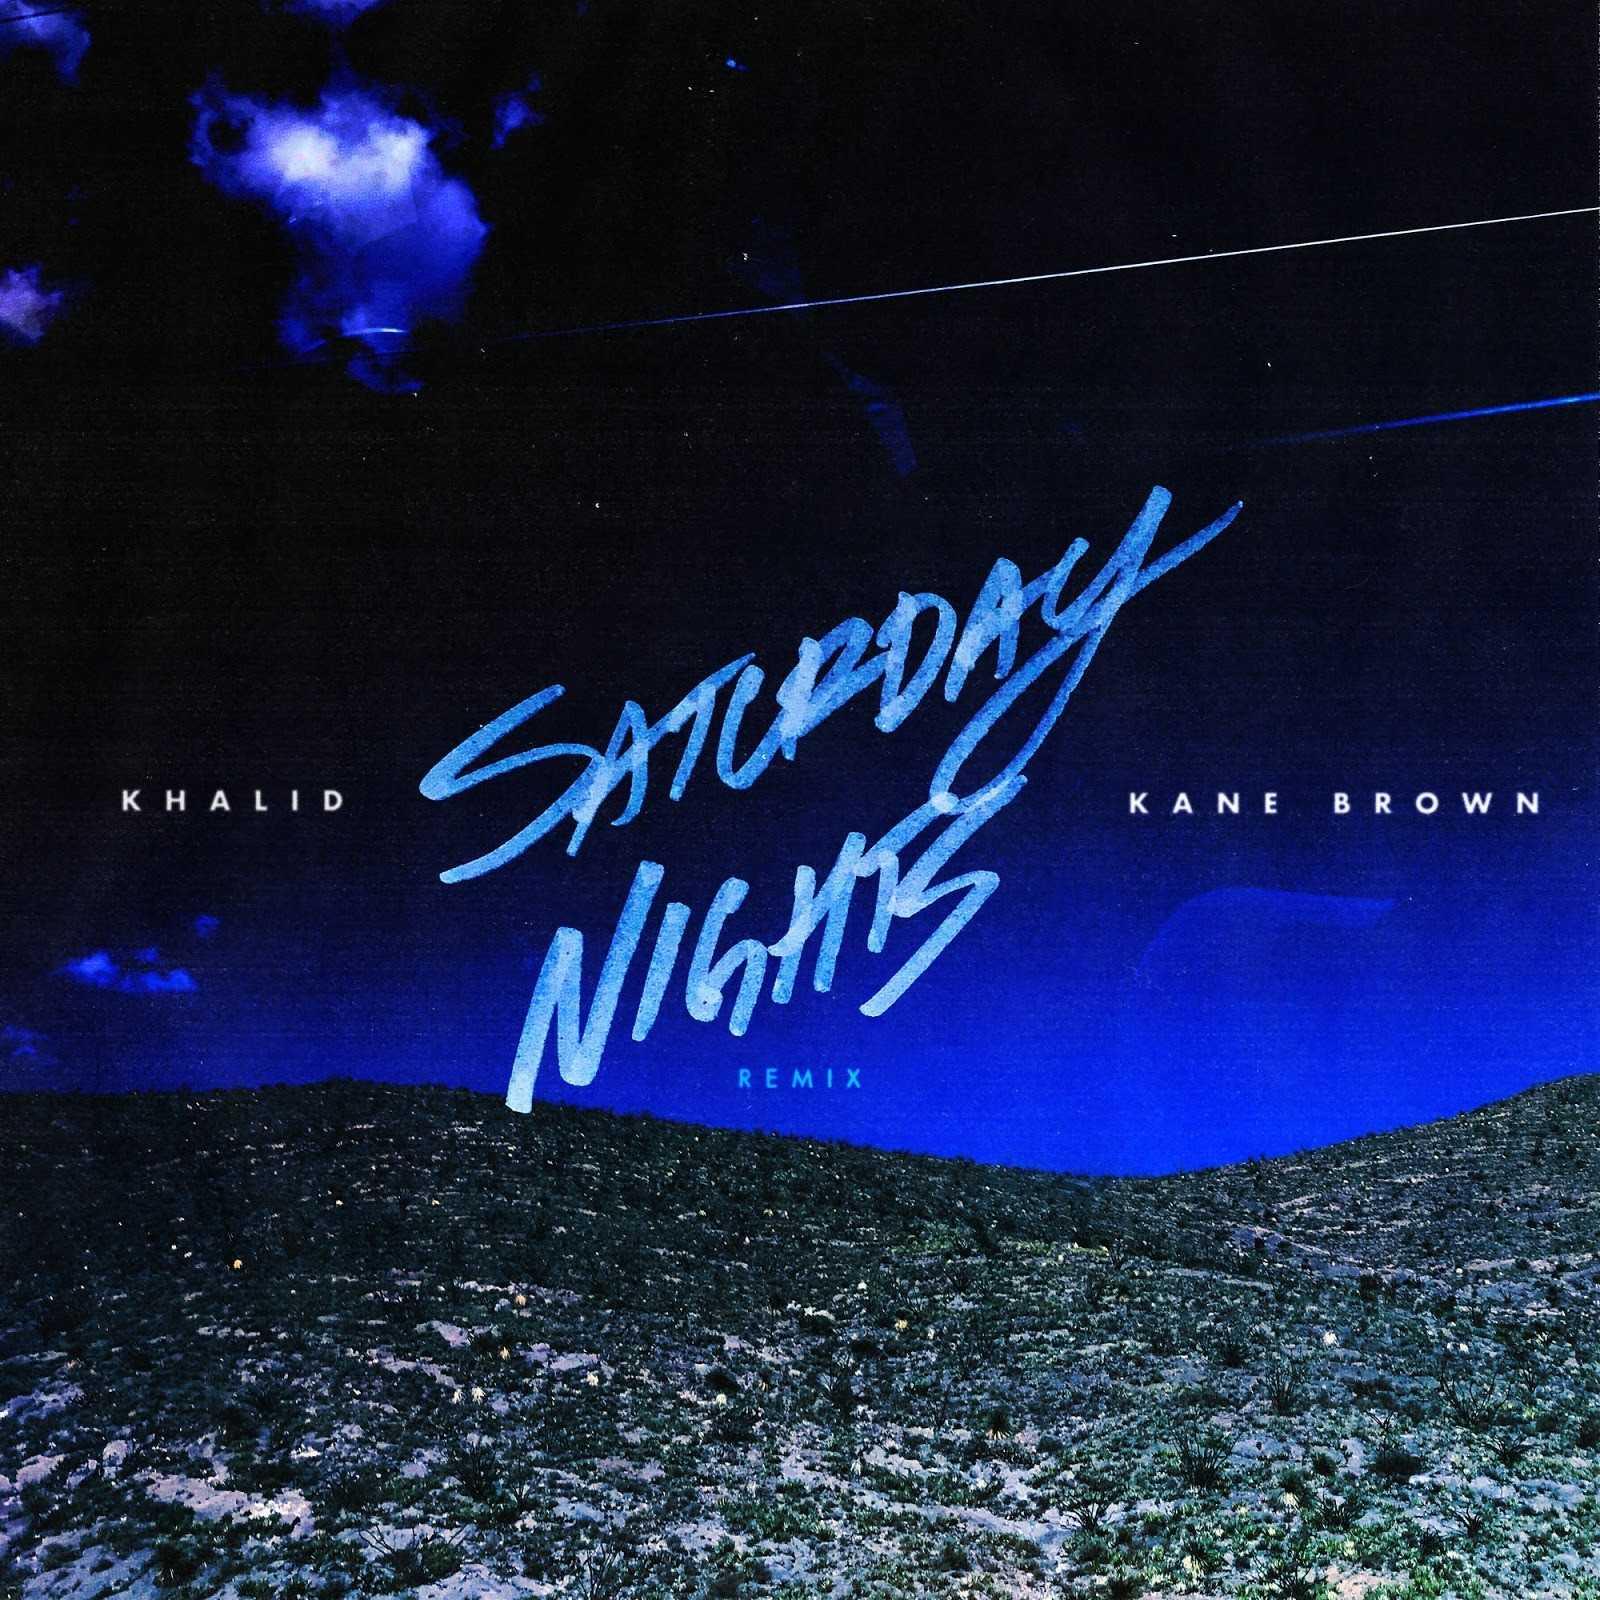 New Single: Khalid | Saturday Nights REMIX (feat. Kane Brown) [Audio]